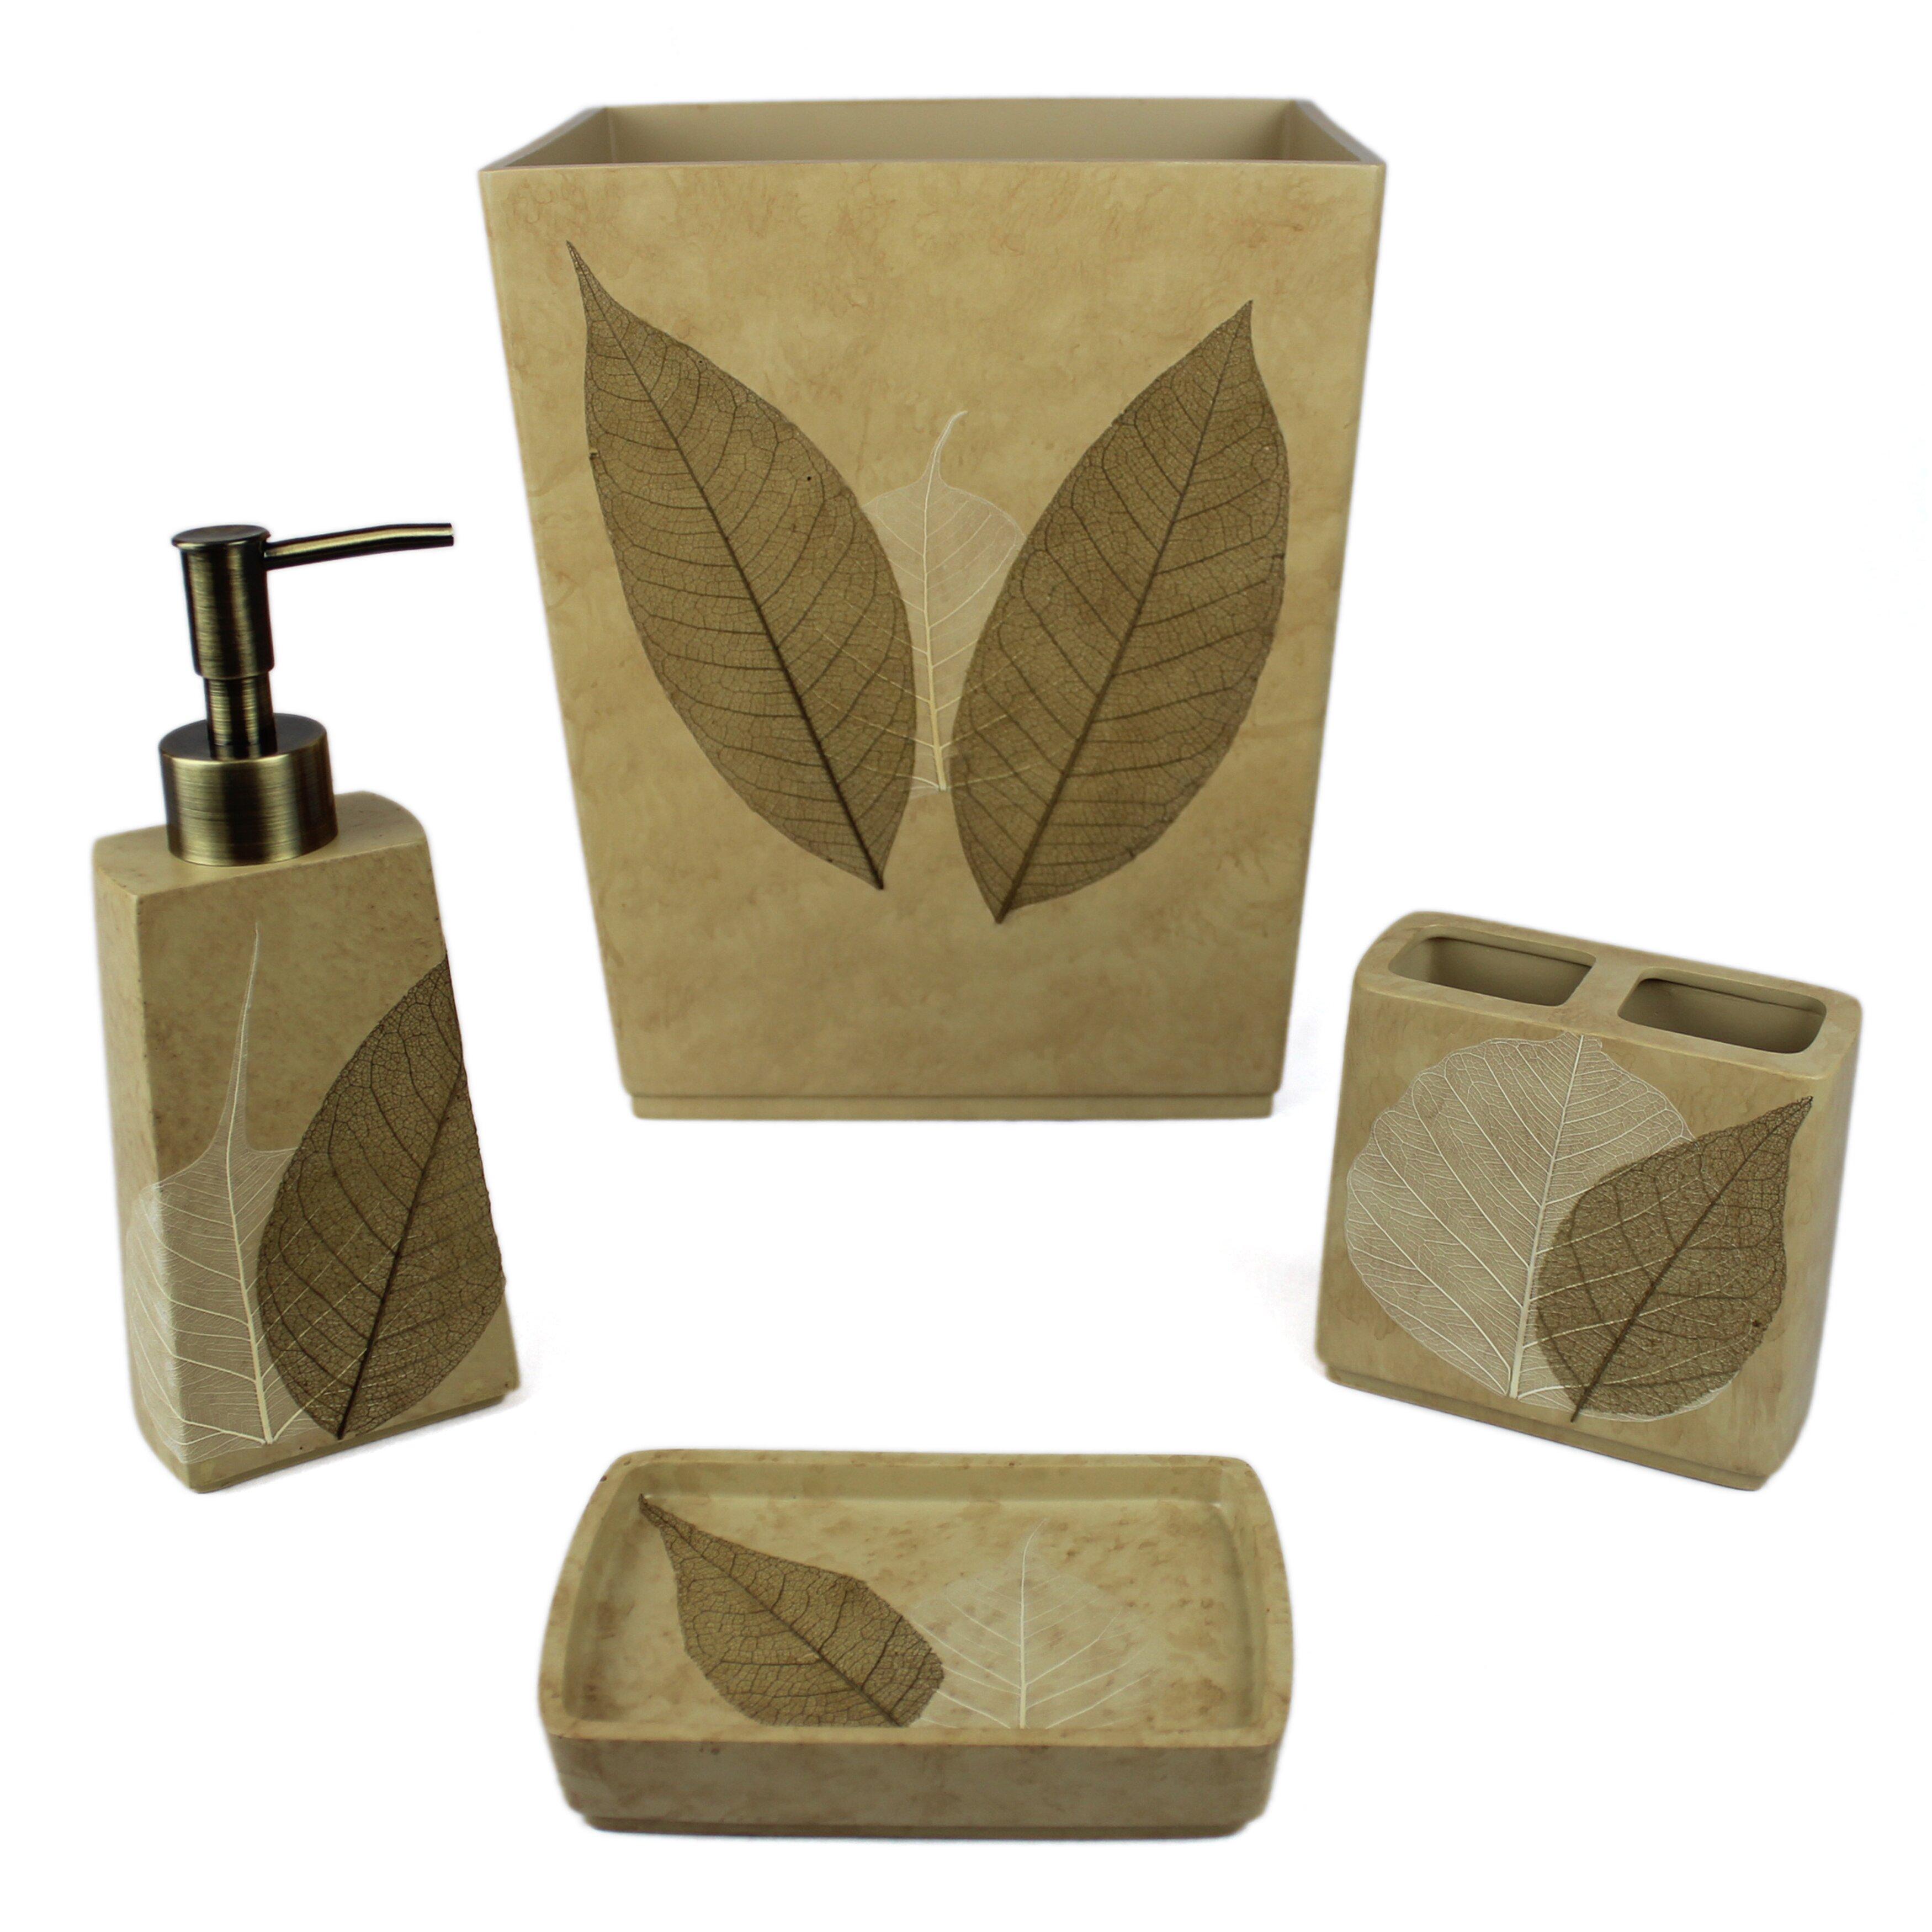 Sherry kline rindge 4 piece bathroom accessory set for Bathroom 4 piece set